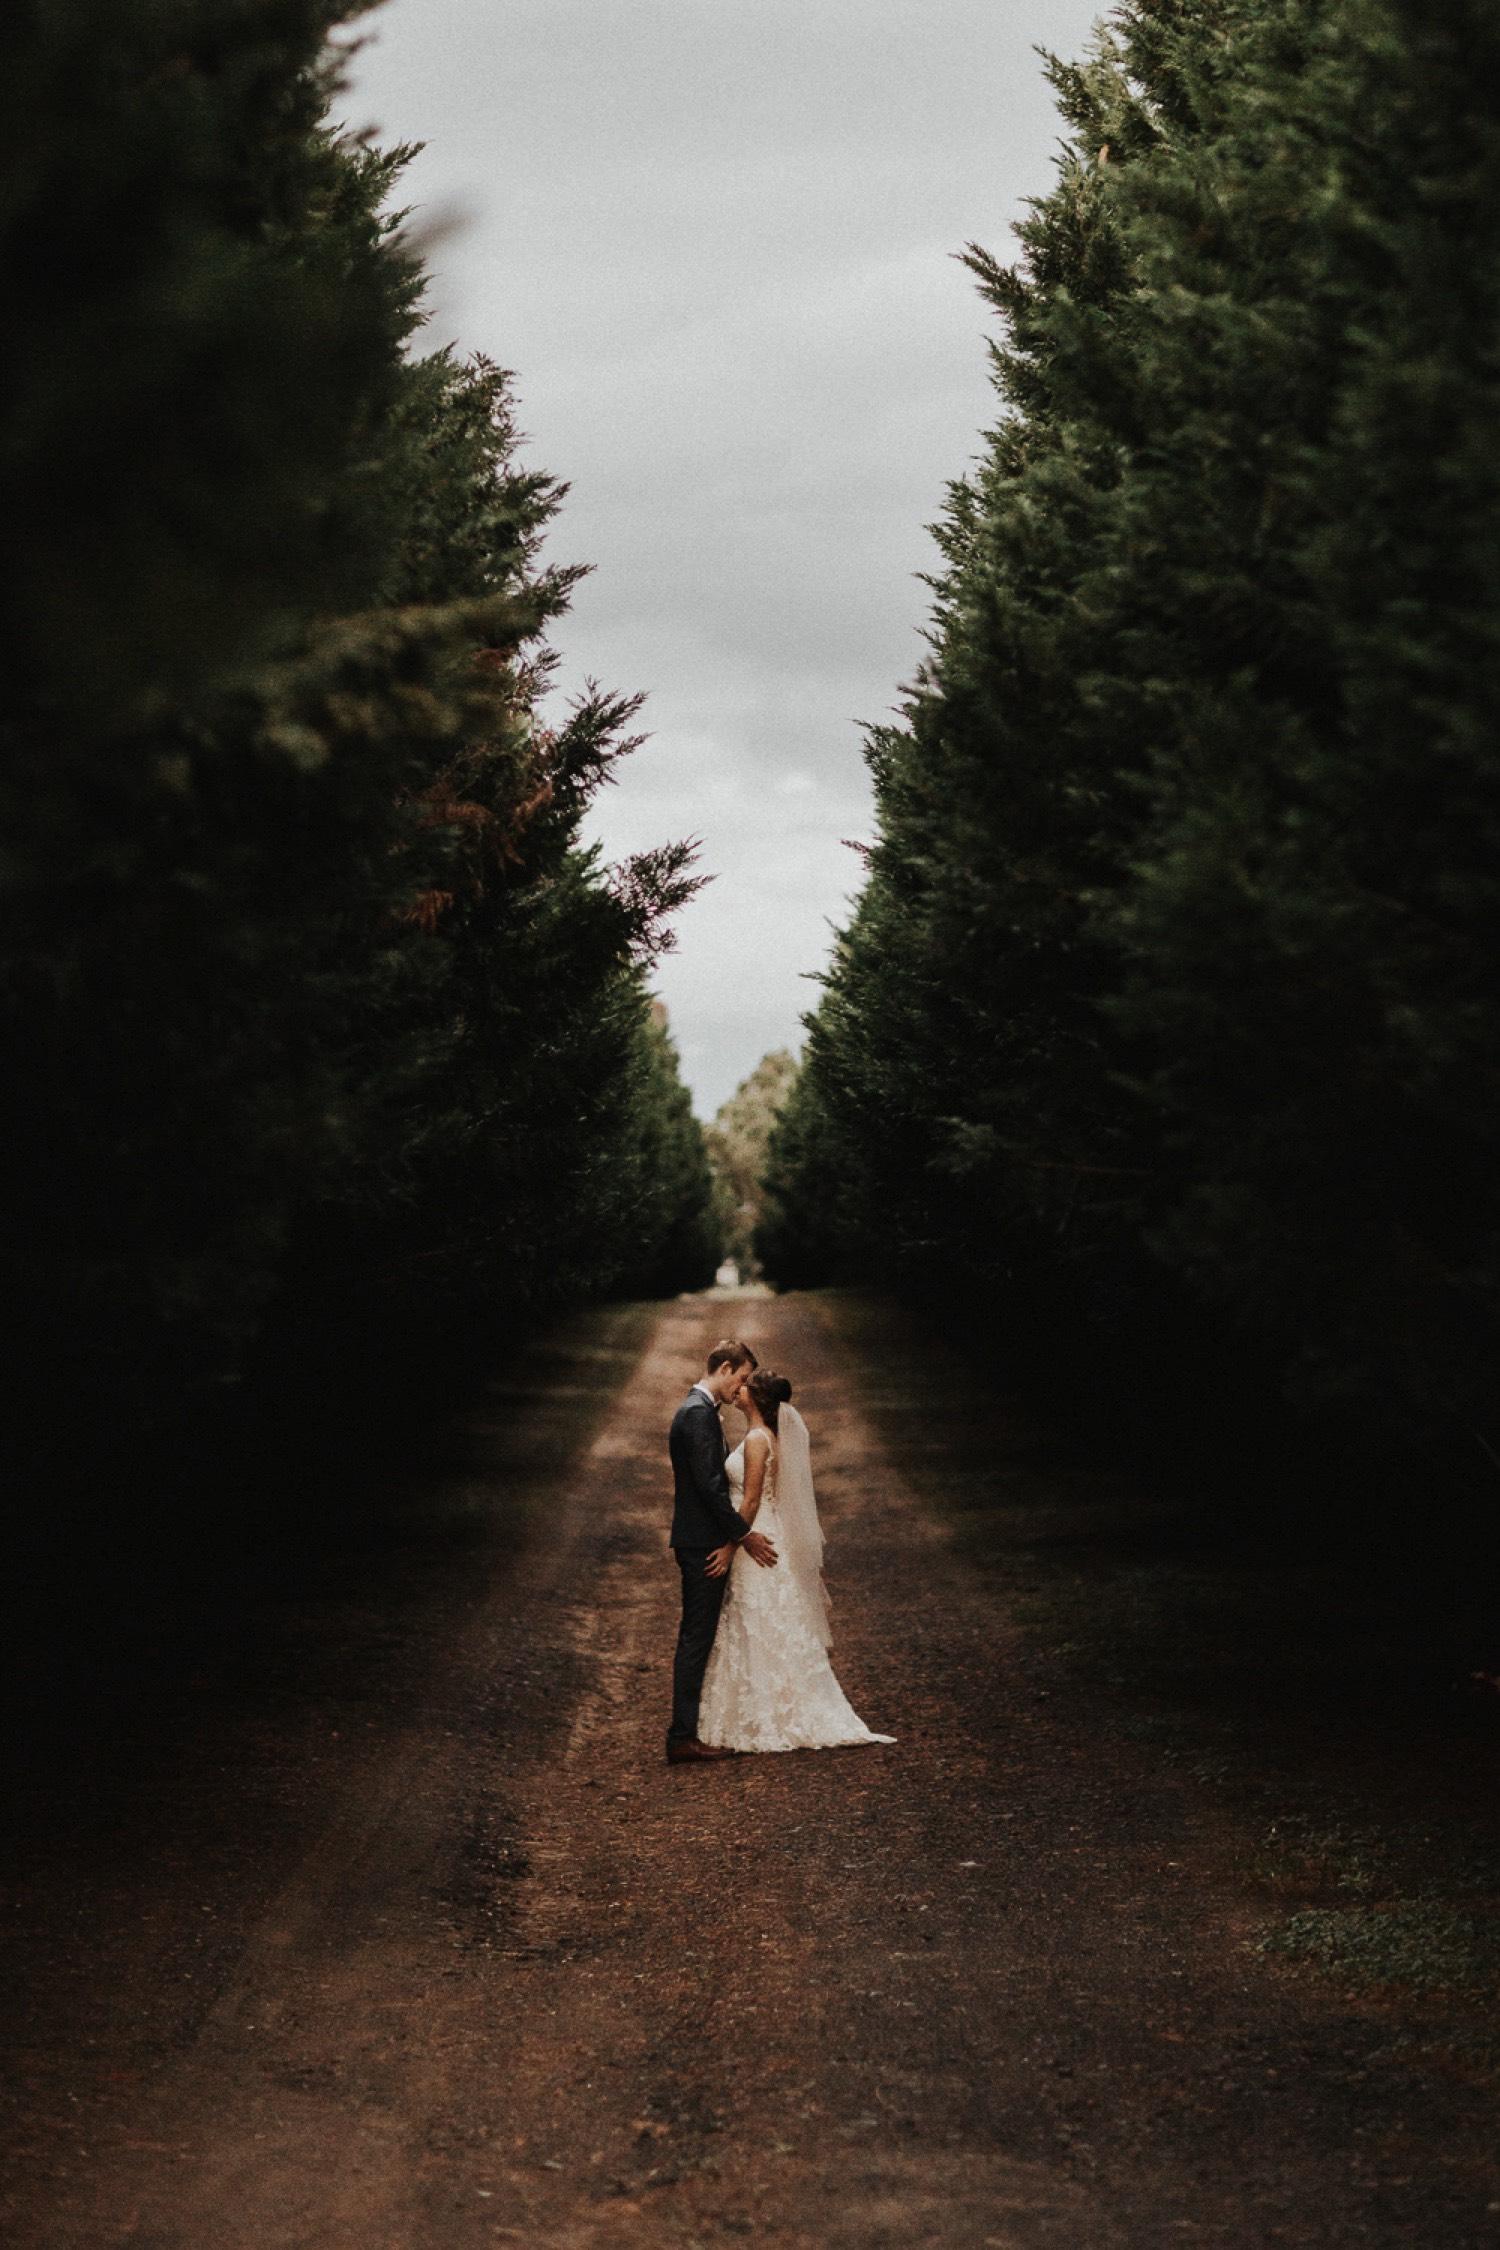 Rustic Country Wedding Photography 77.jpg